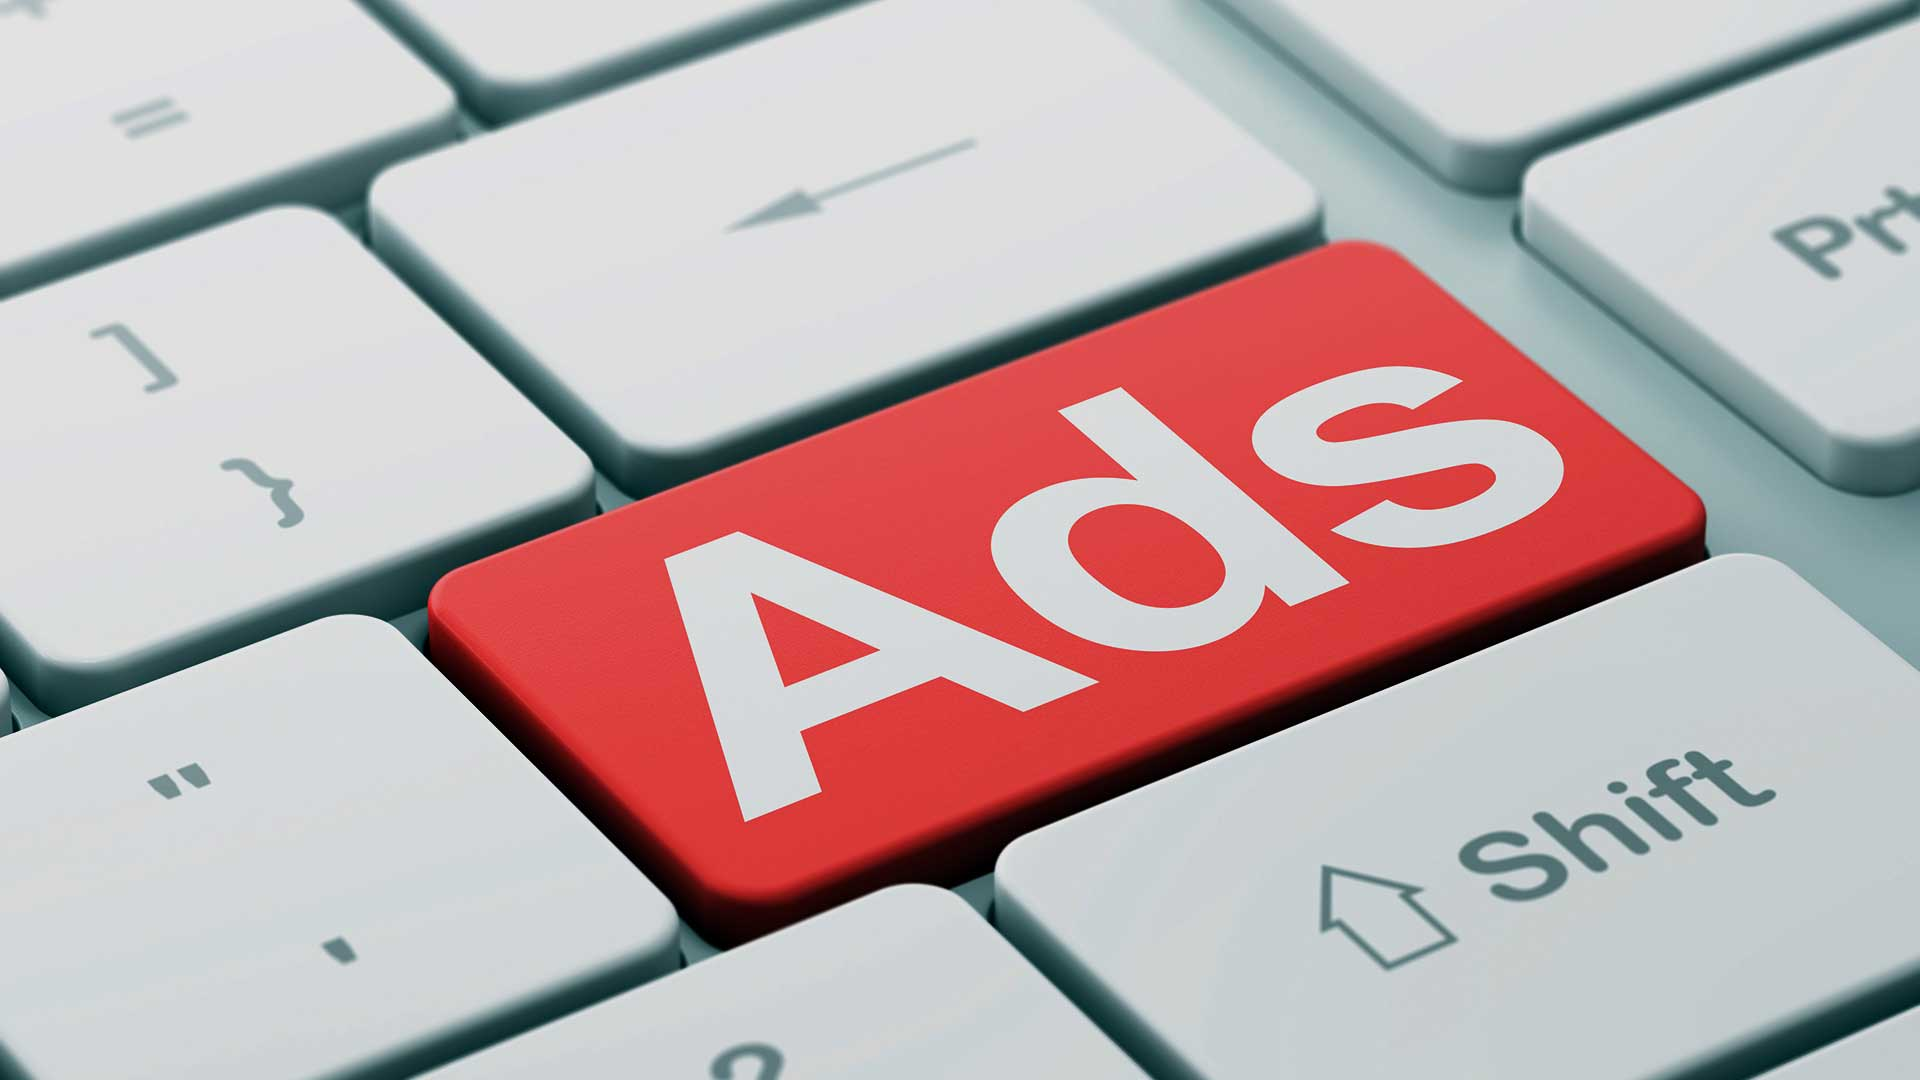 internet-reklama-v-stavropole.jpg (67 KB)